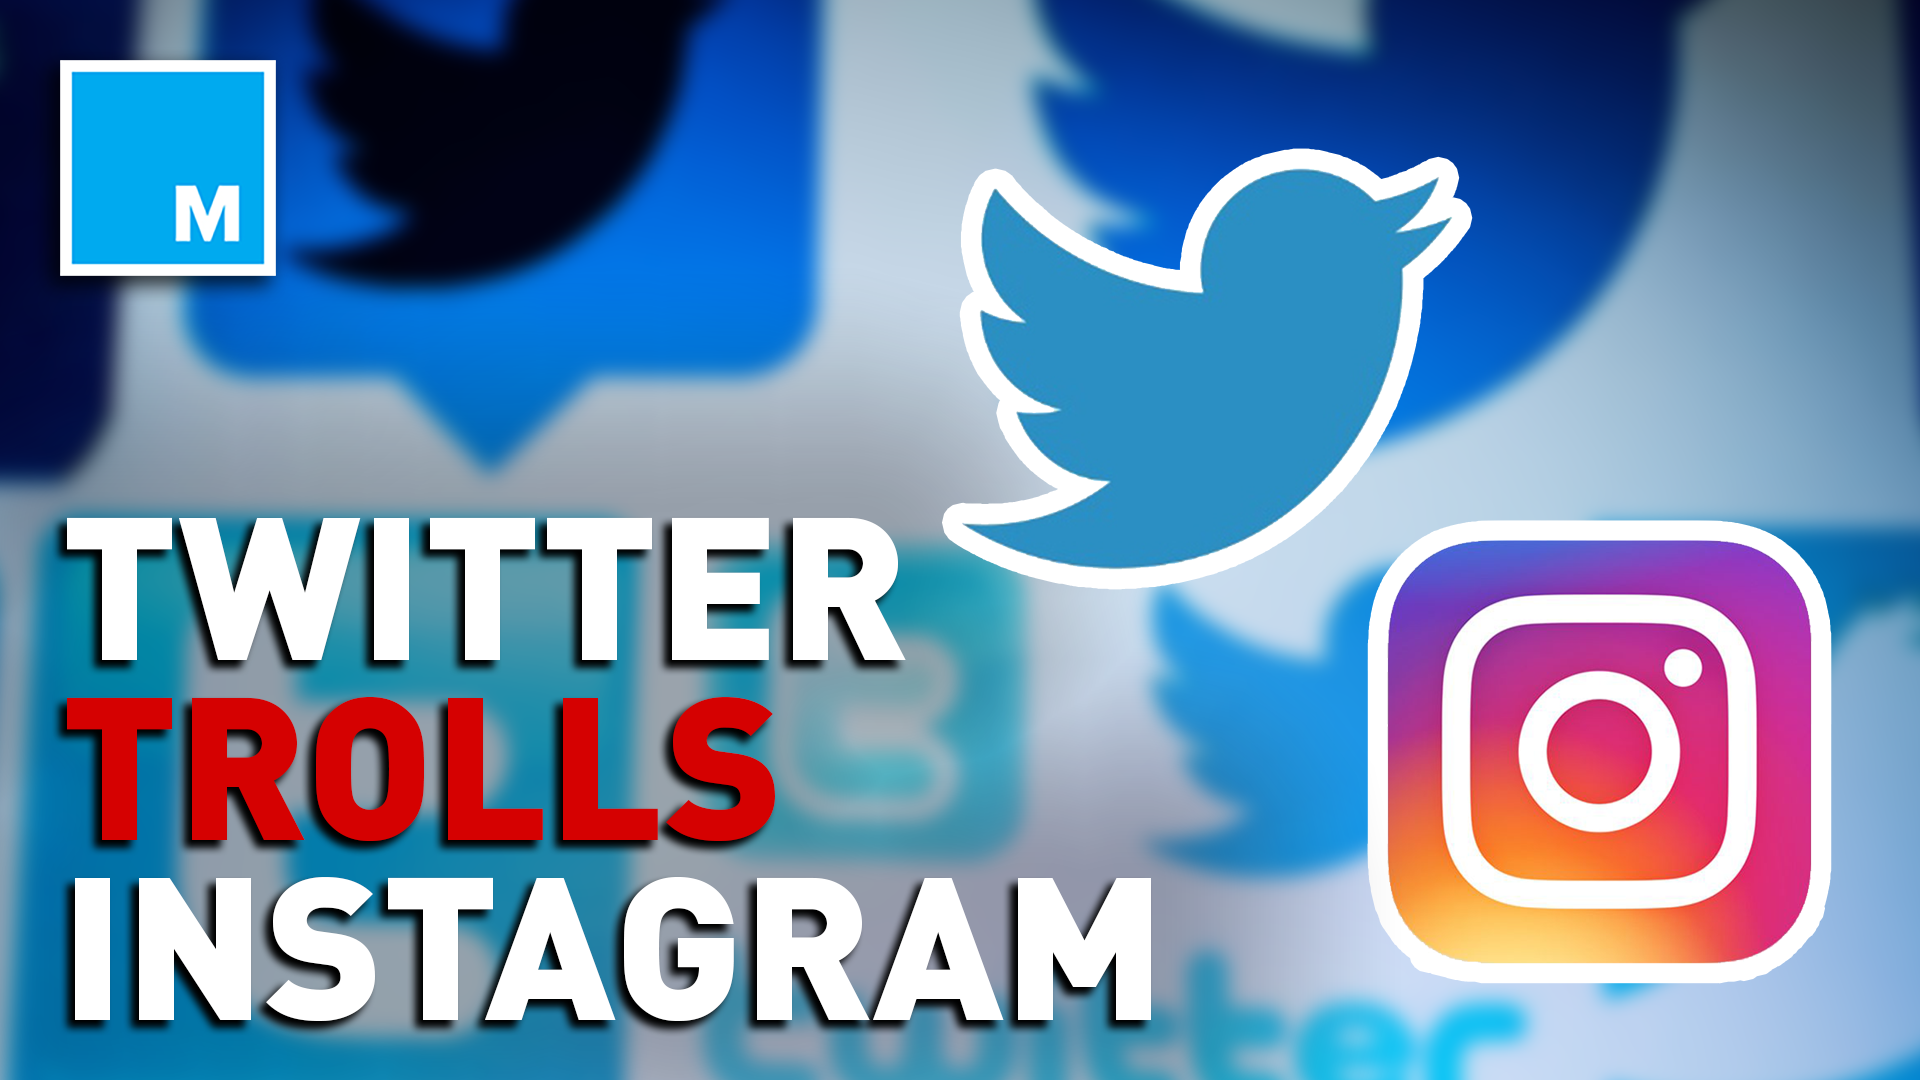 Twitter shades Instagram with screenshots of tweets to Instagram